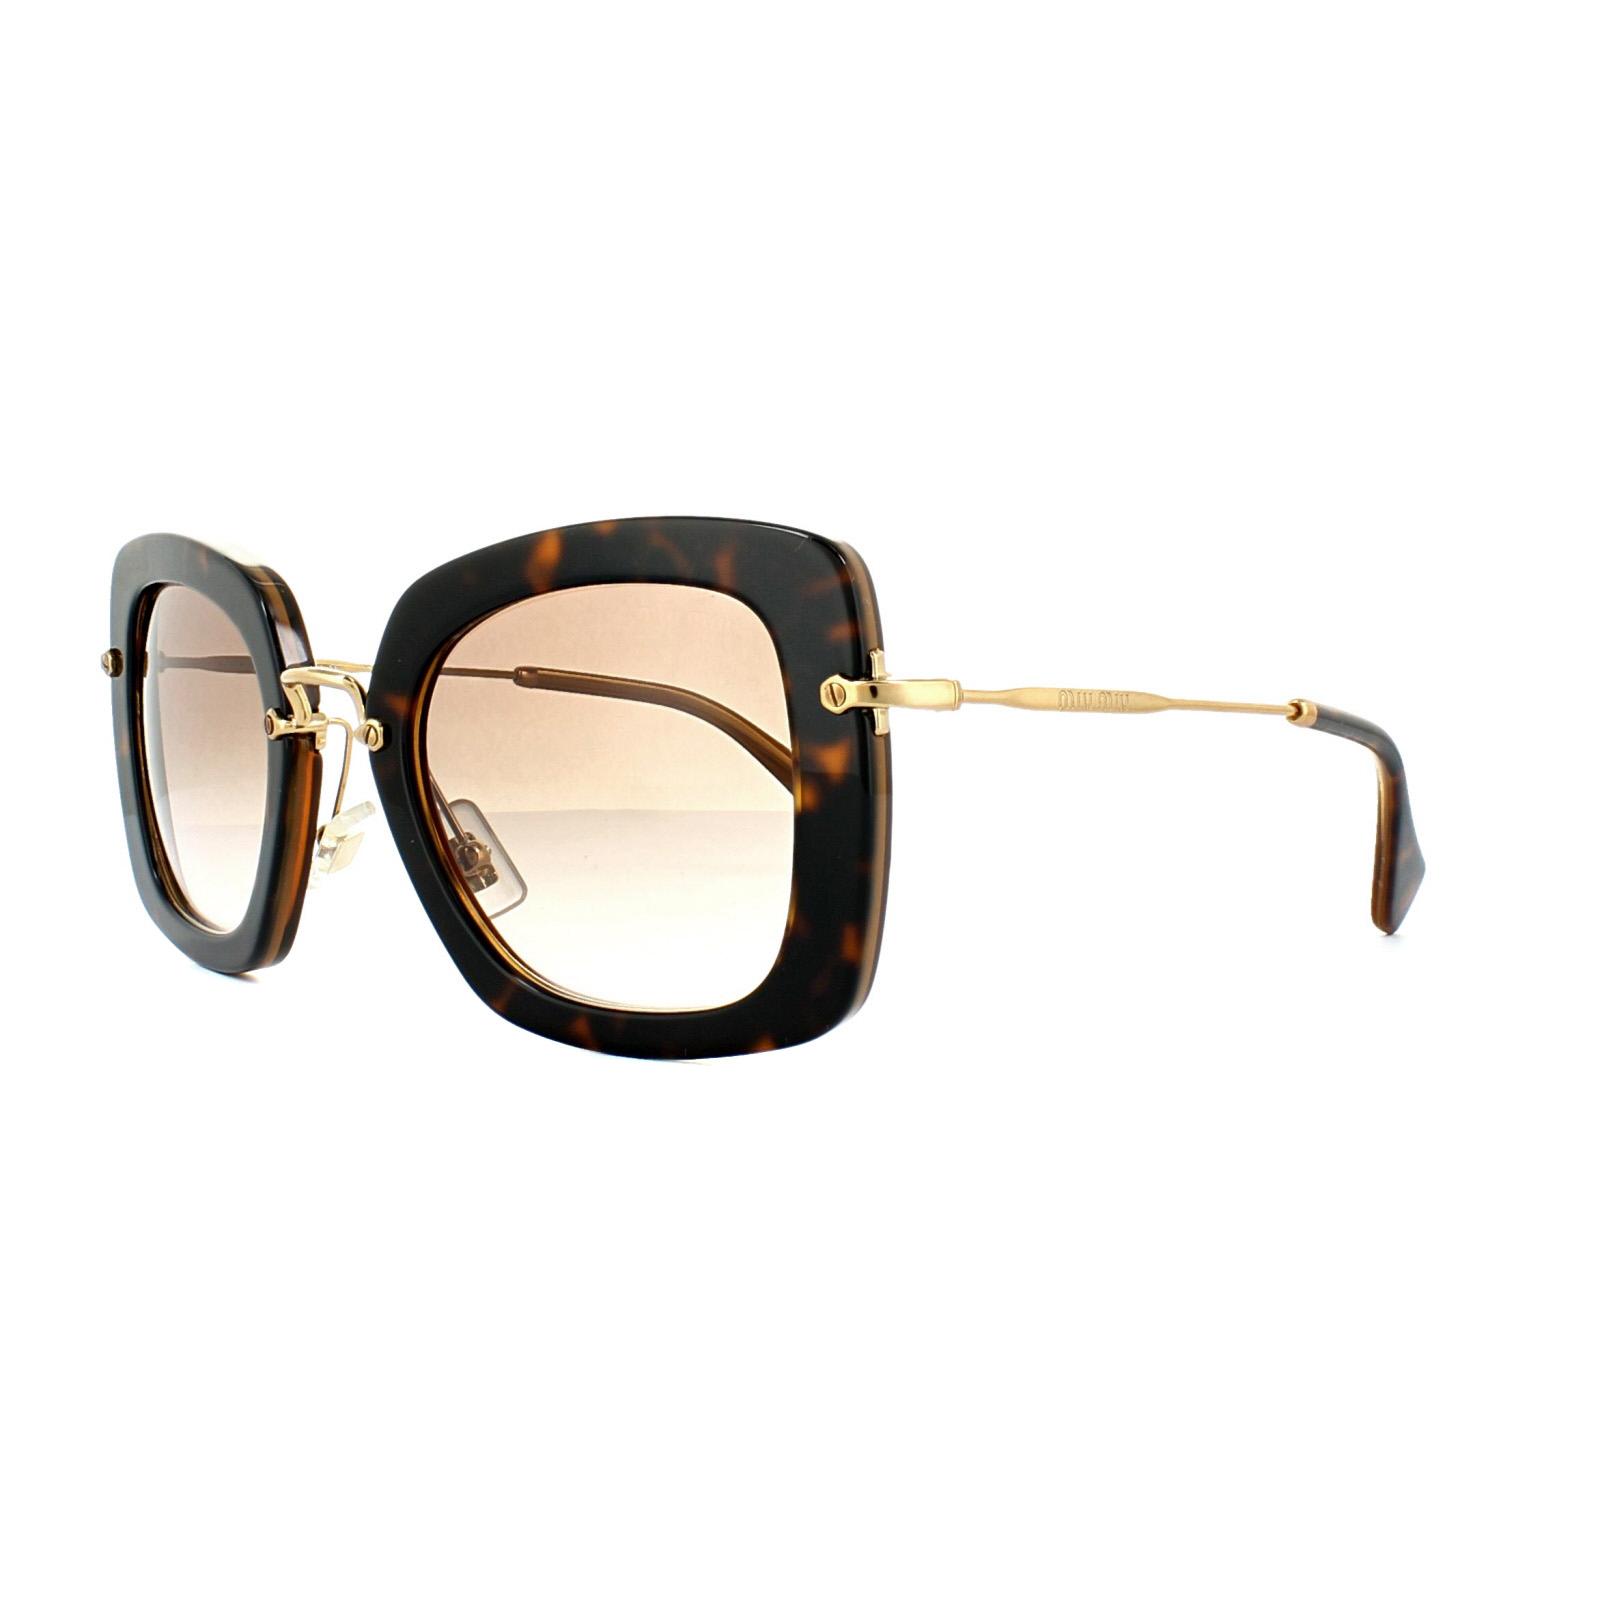 Miu Miu Sunglasses 07OS KAZ0A6 Top Havana Opal Brown Gradient ...